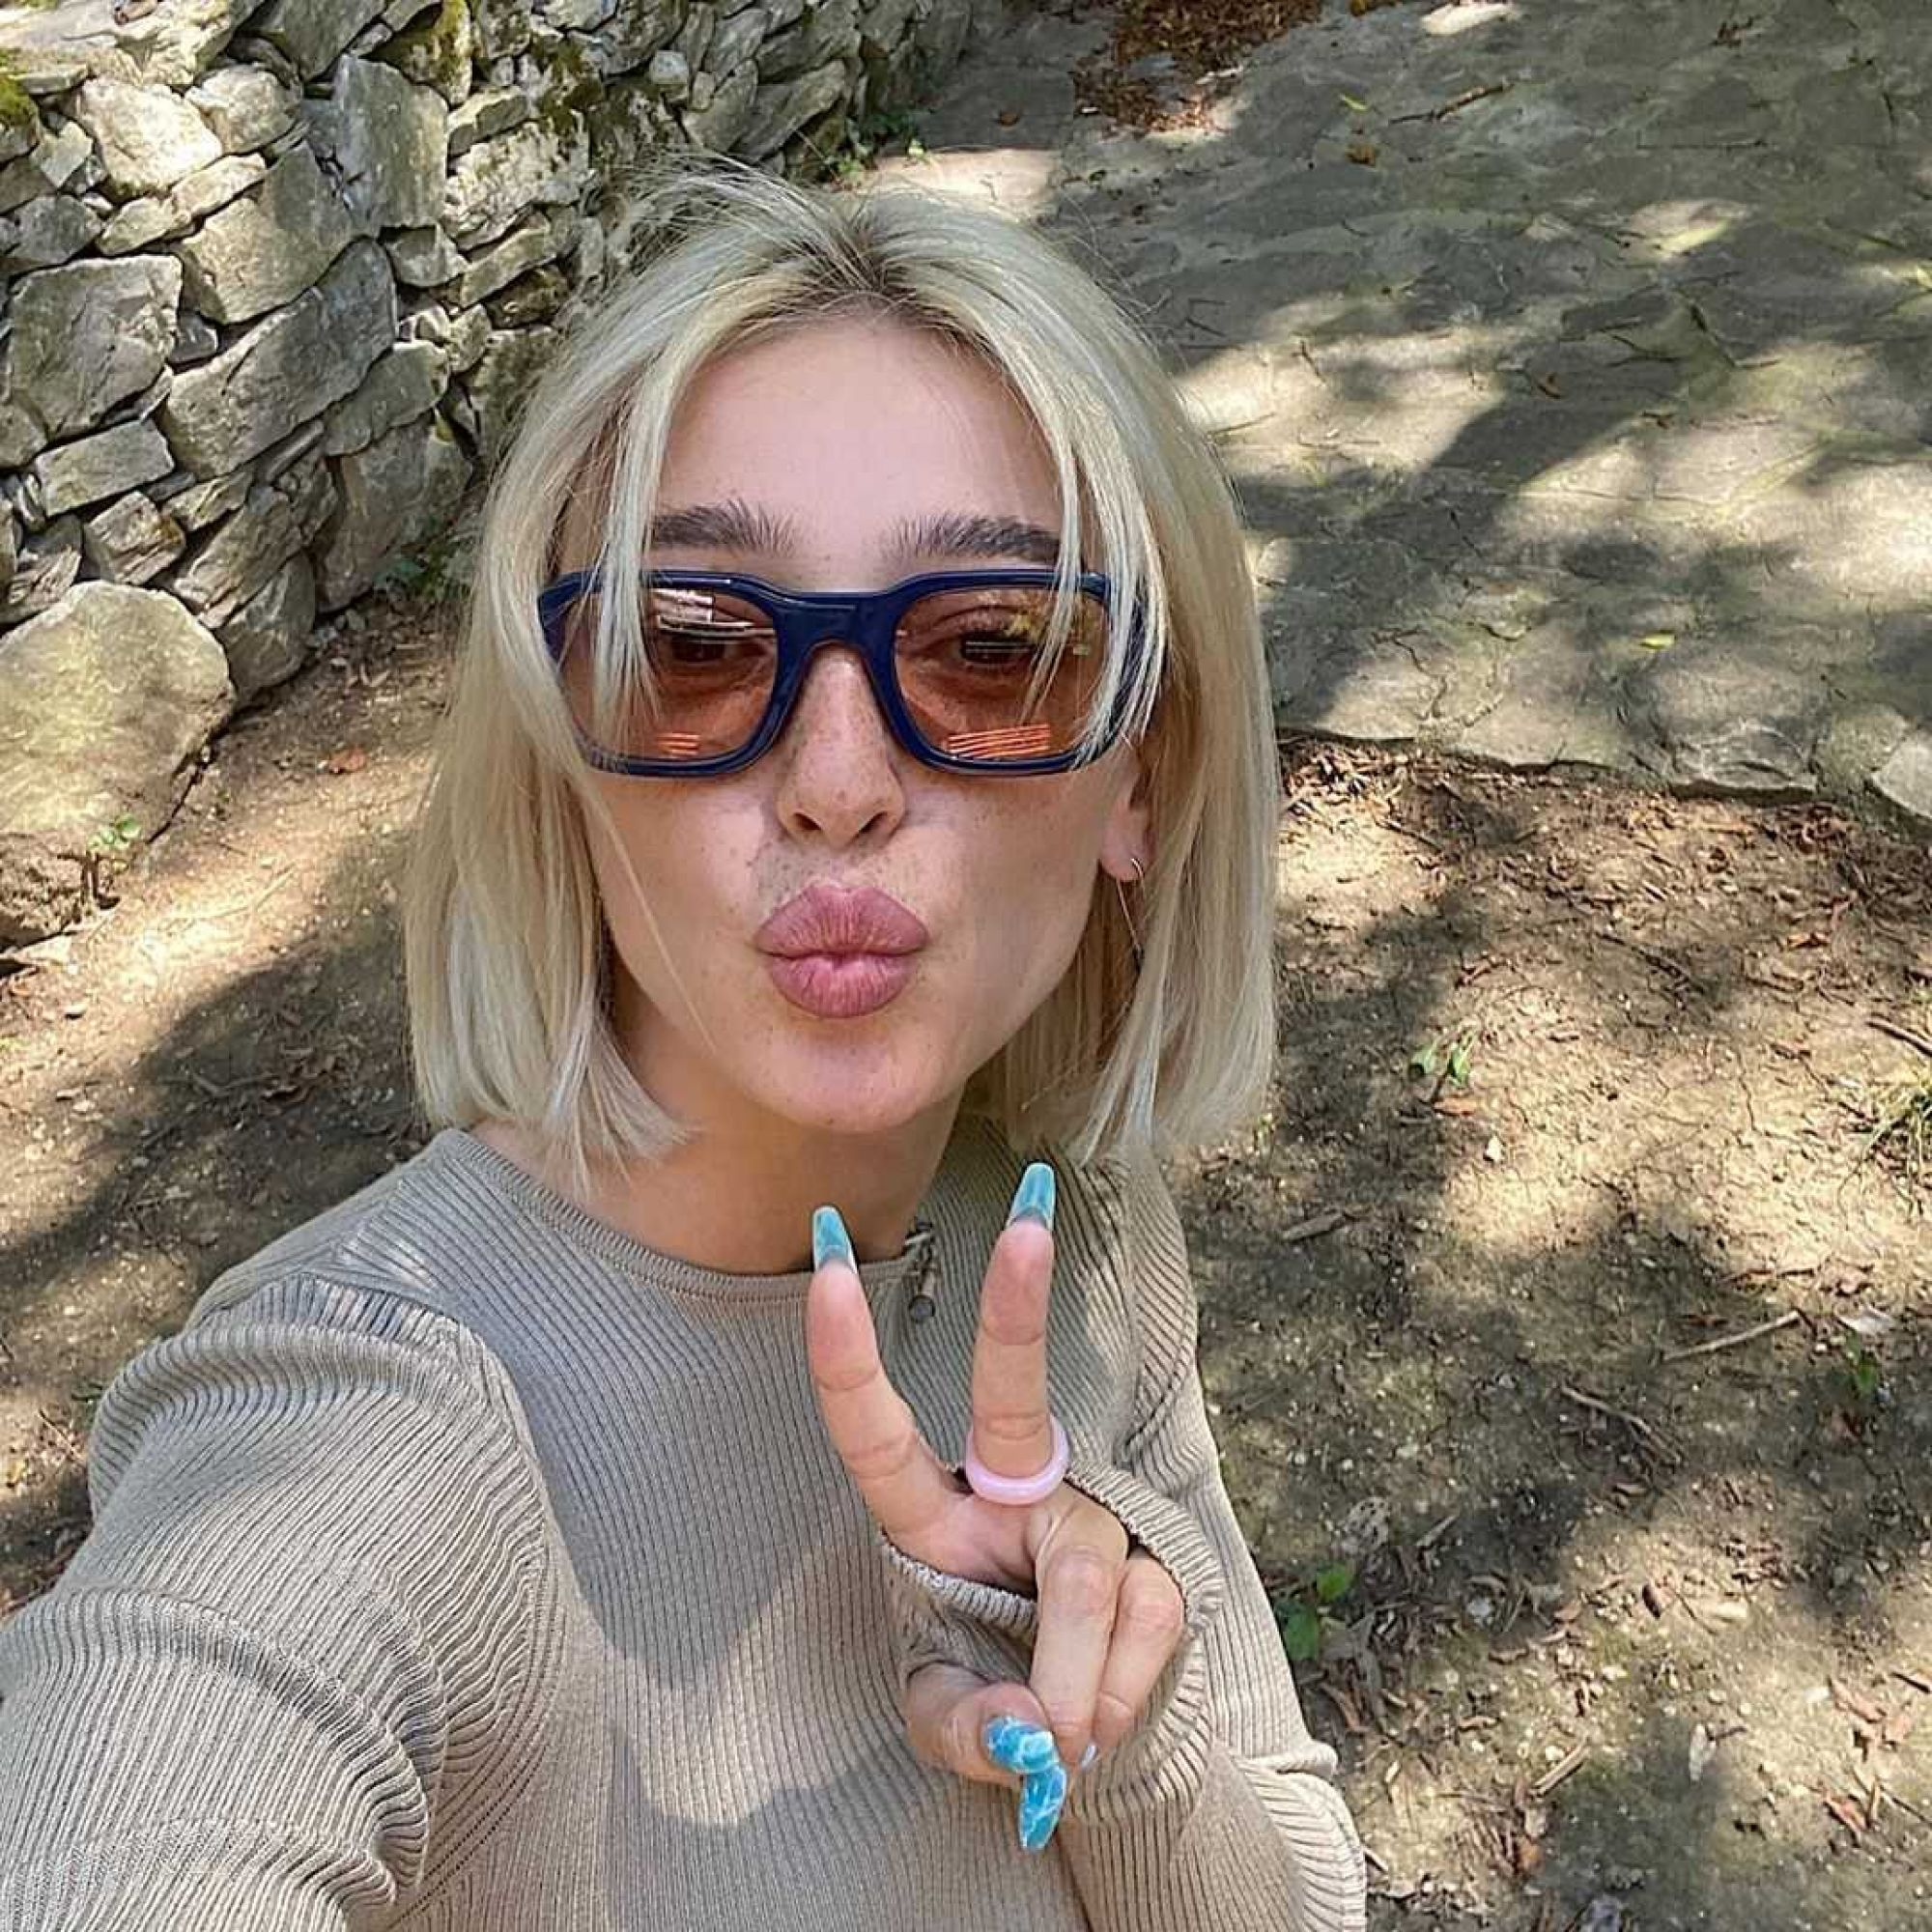 Настя Ивлеева в рамках пари показала фото с пометкой «18+»